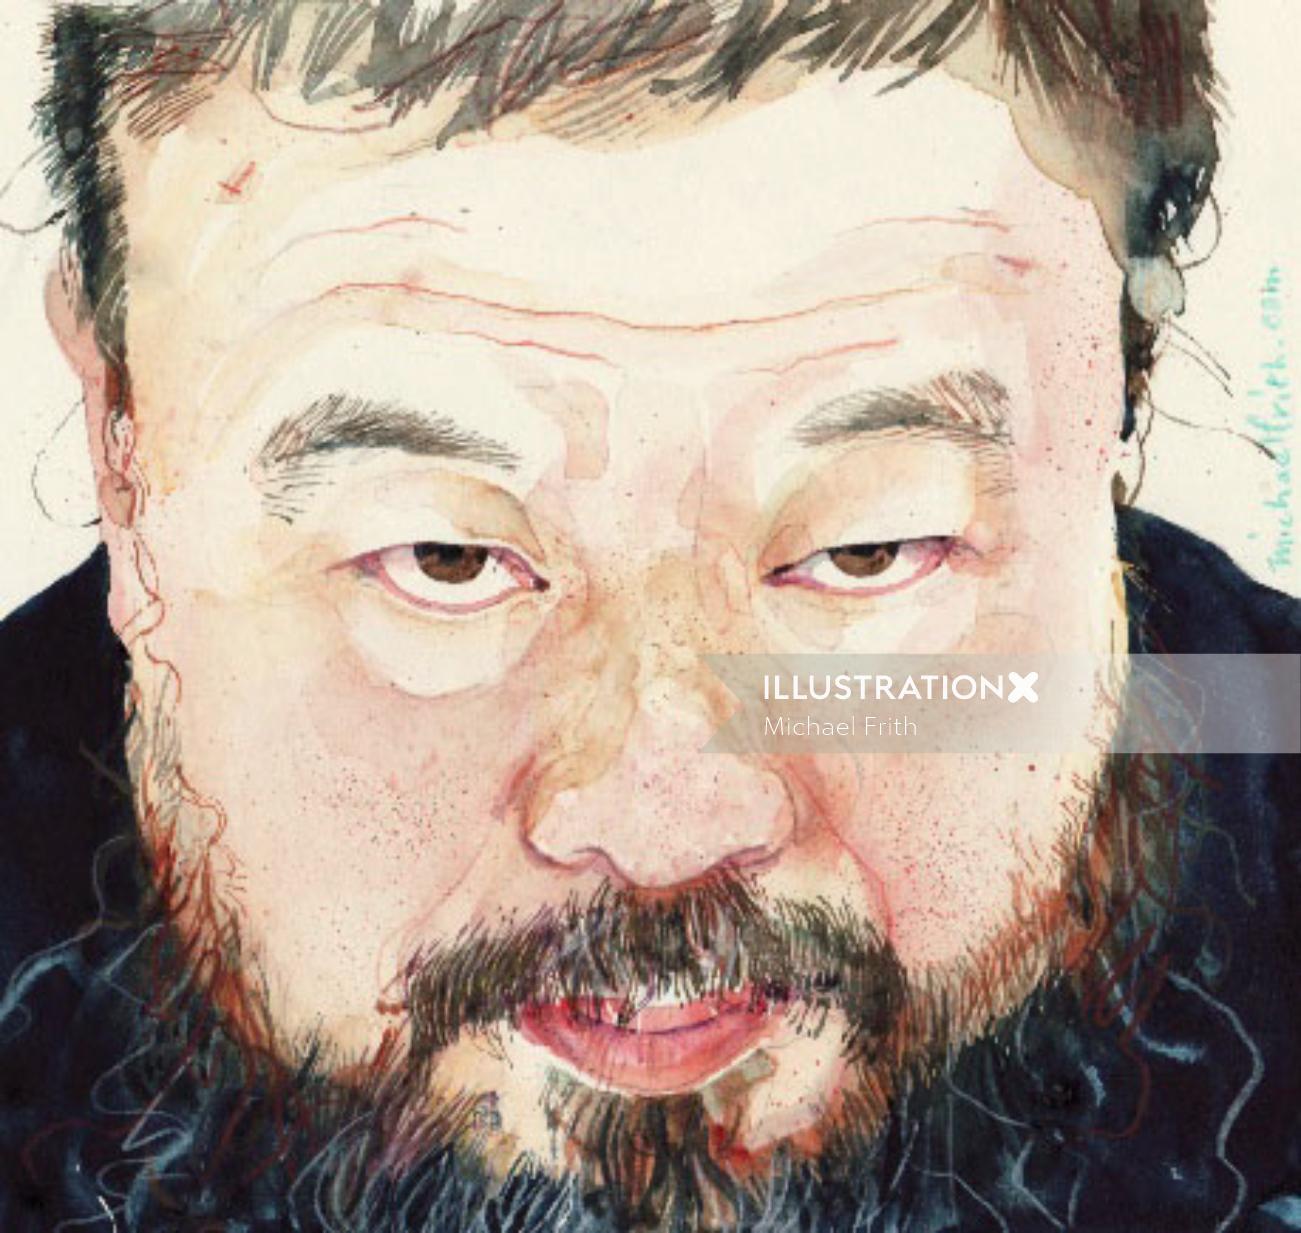 Chinese man portrait illustration